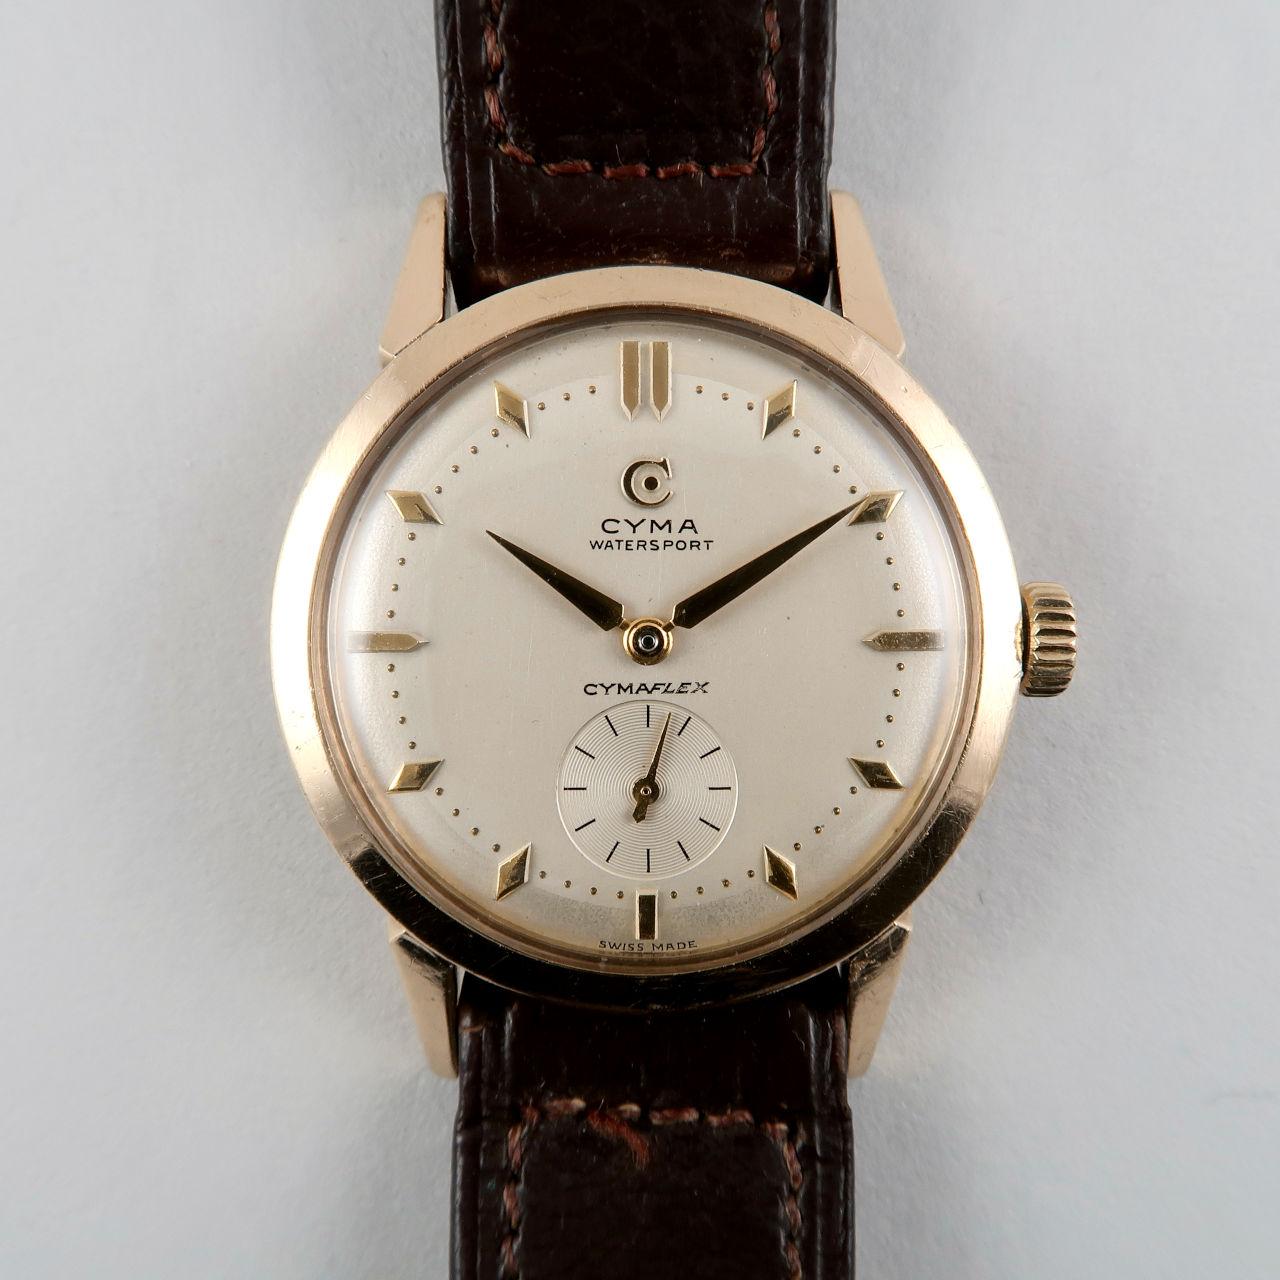 Cyma cal. R.458 hallmarked 1954 | 9ct gold hand wound wristwatch